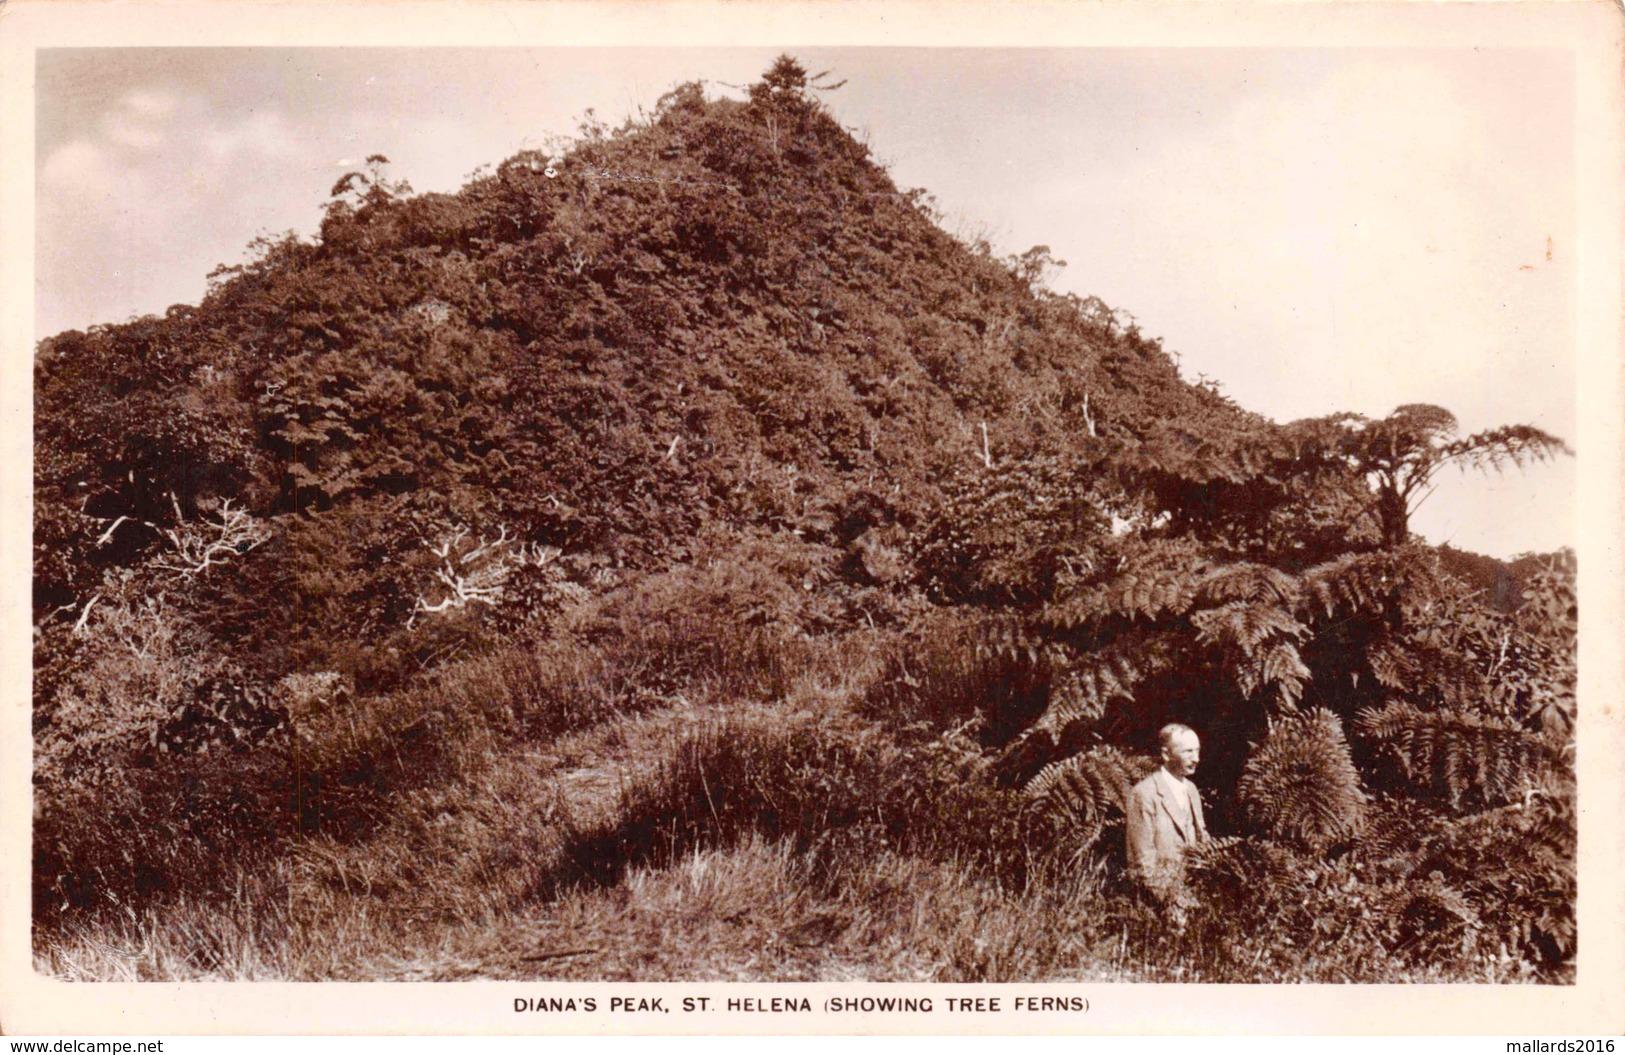 ST. HELENA - DIANA'S PEAK & TREE FERNS ~ A REAL PHOTO POSTCARD #92811 - St. Helena